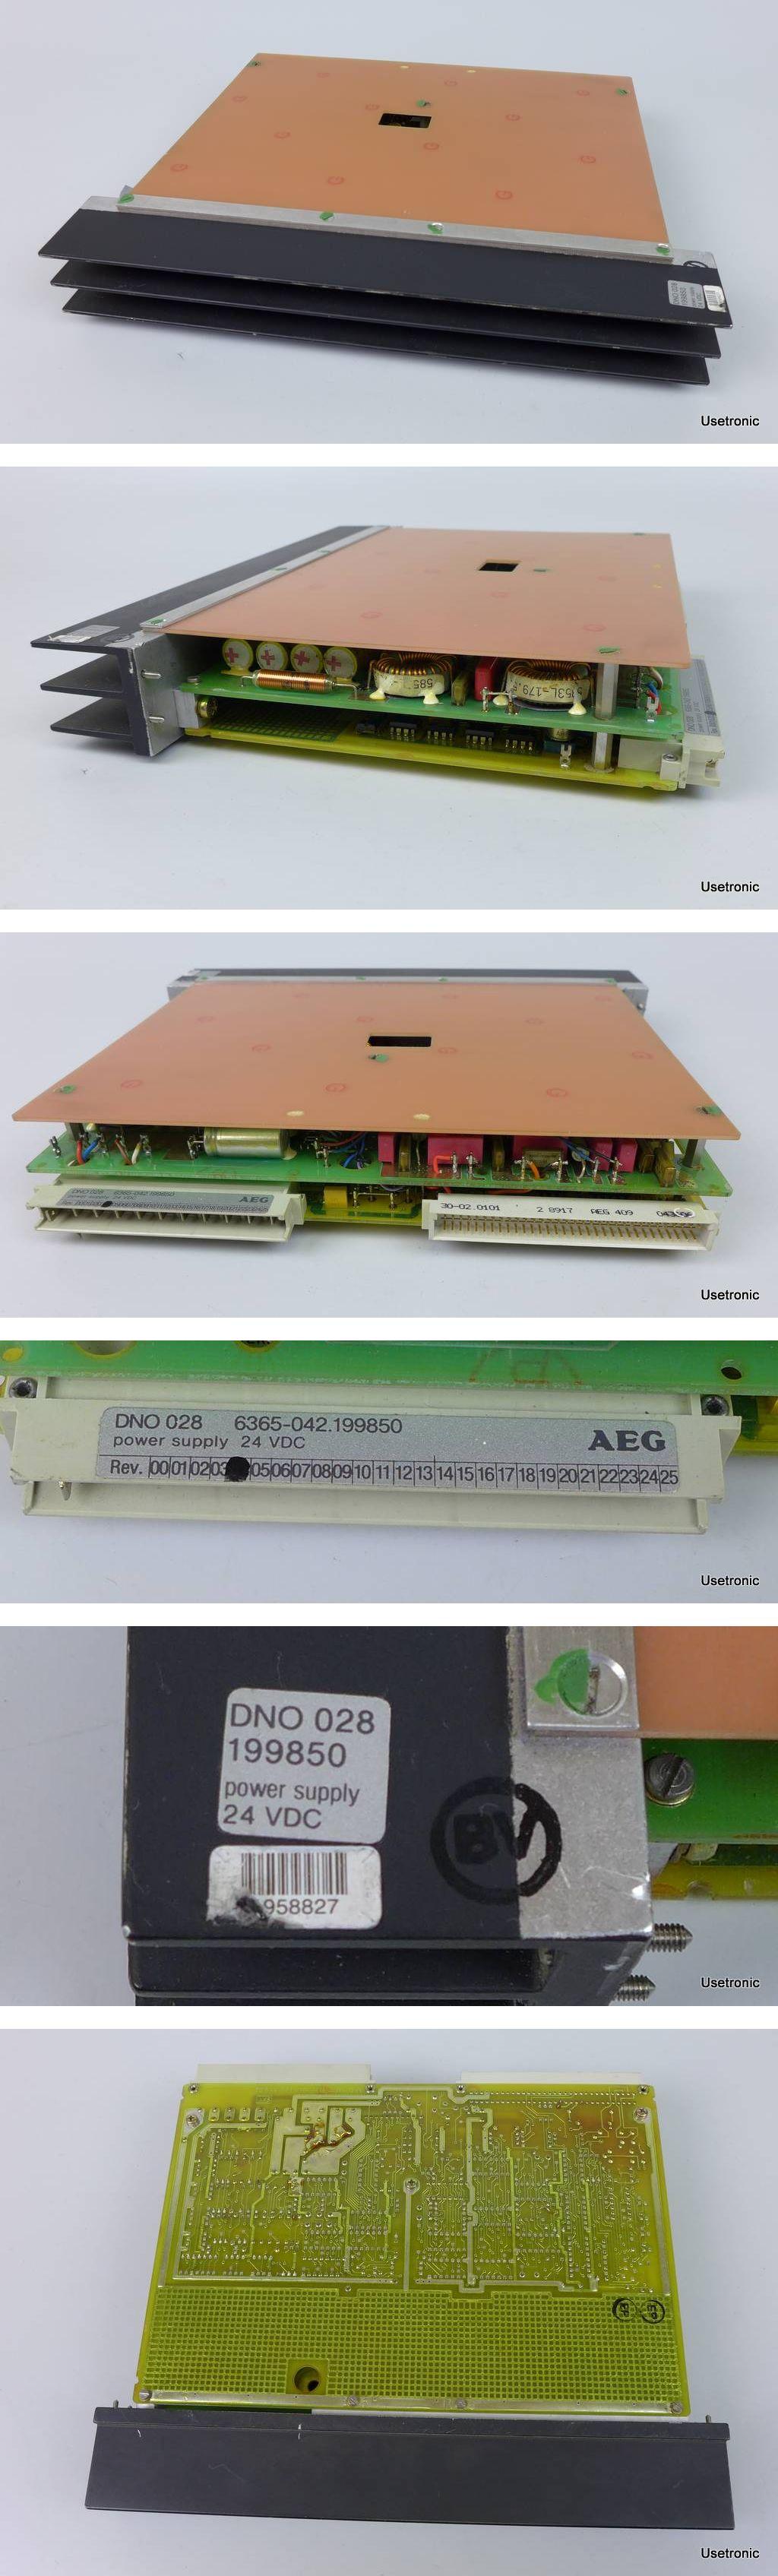 AEG DNO 028 6365-042.199850